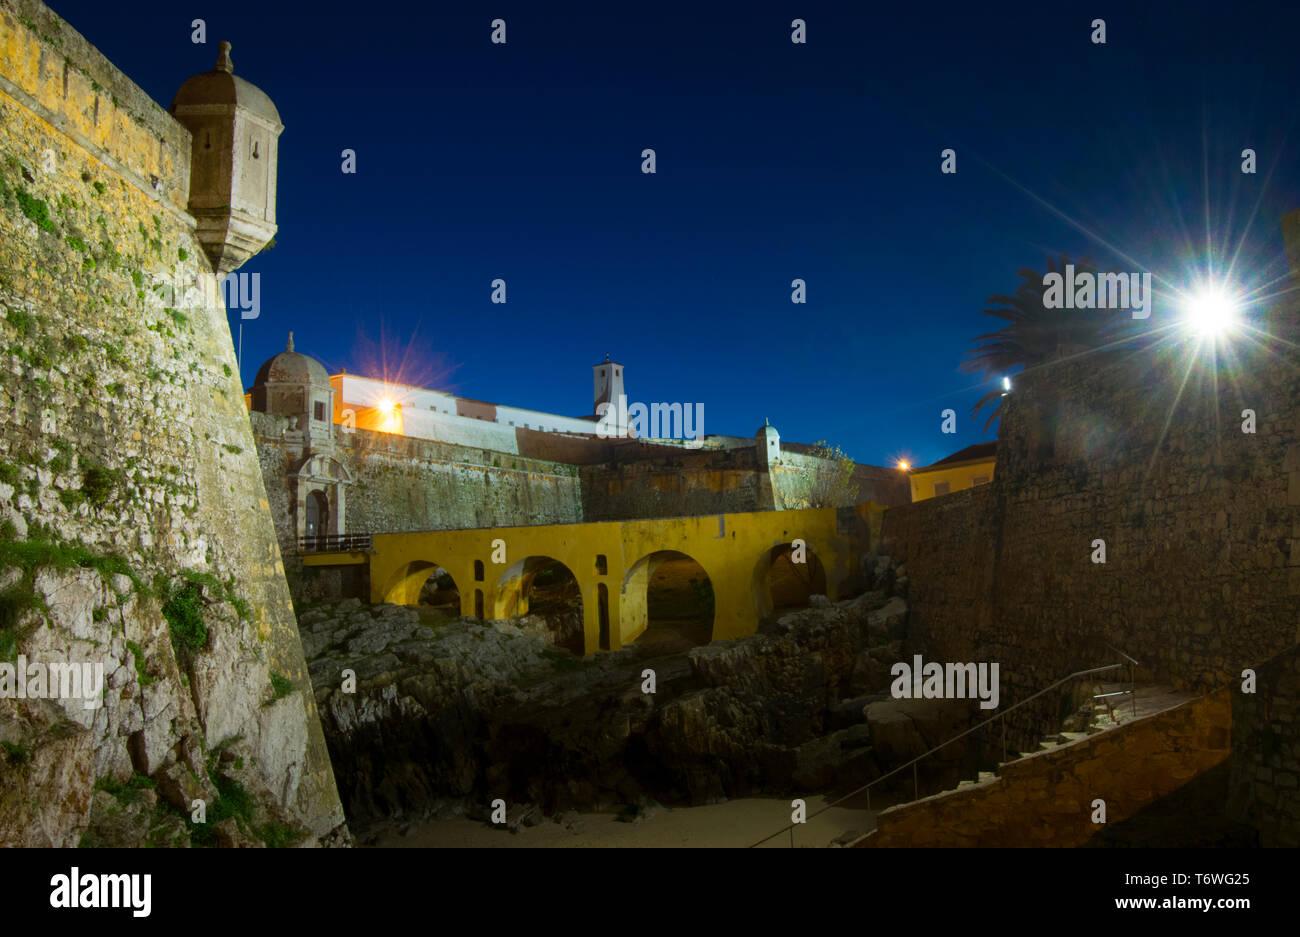 Old Citadel ( Fortaleza ) at night in Peniche Portugal - Stock Image